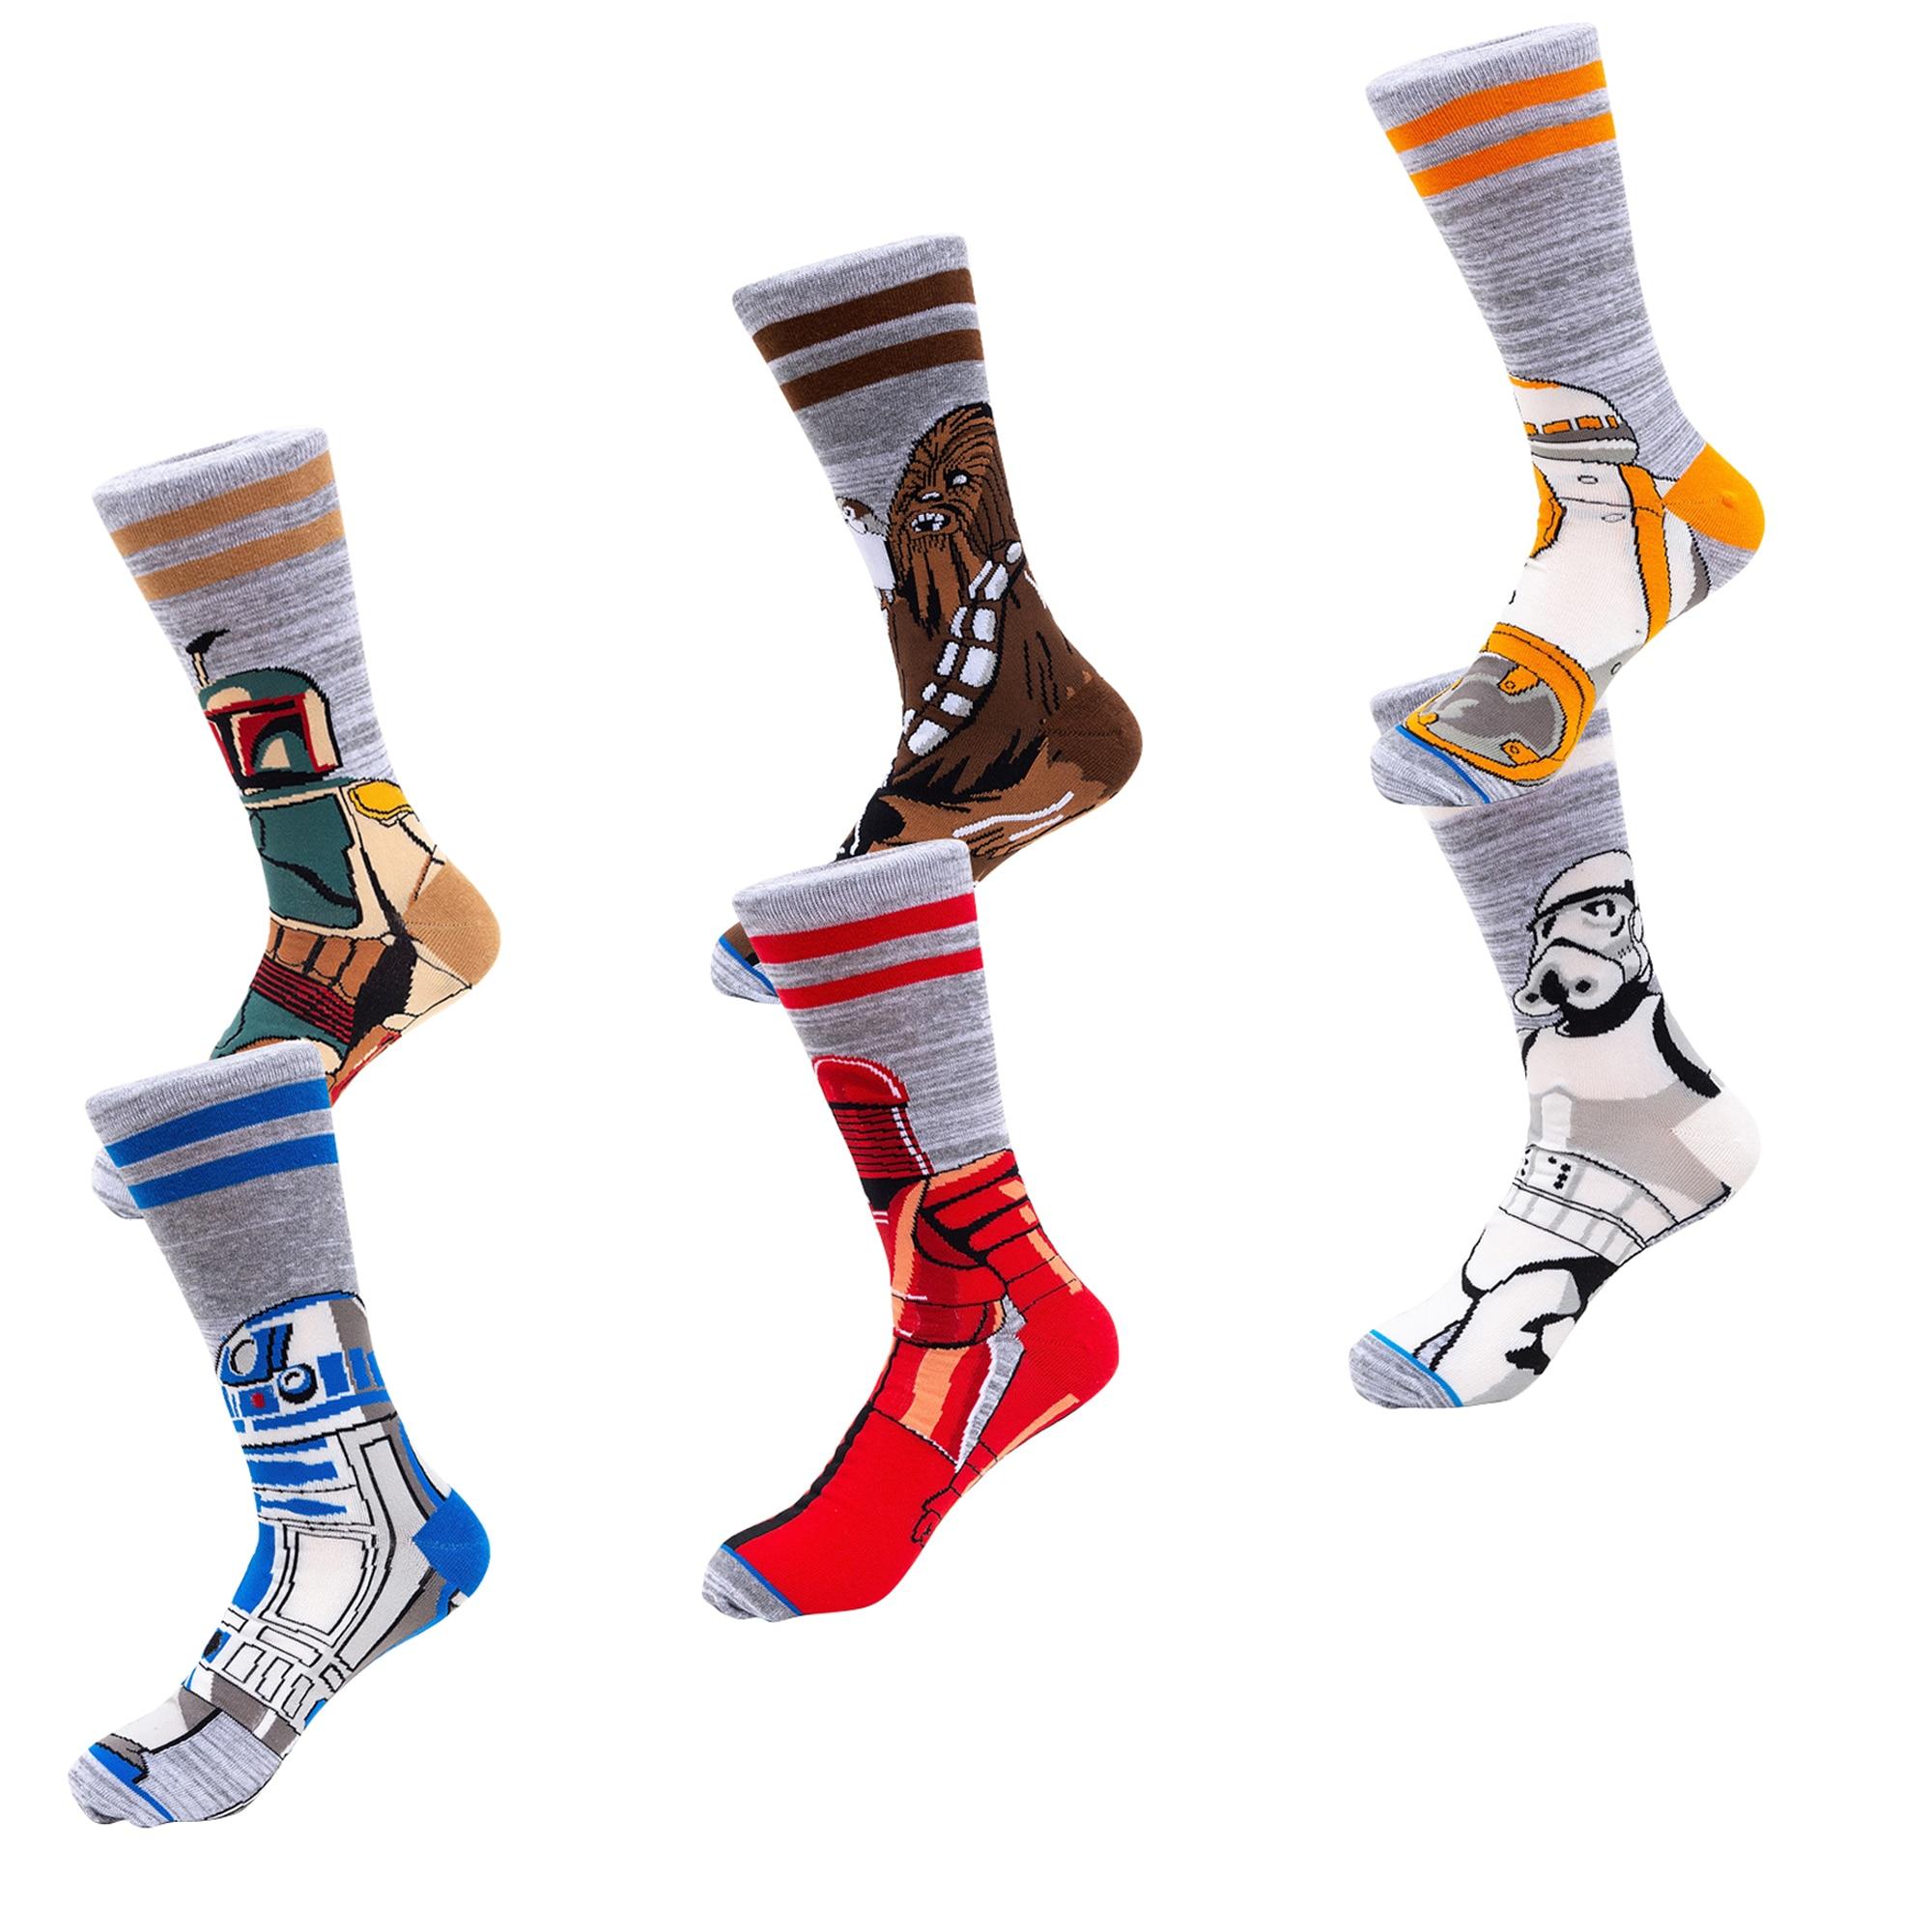 Fashion Women Men Print Funny Socks Casual Sports Cotton Long Socks Stockings US